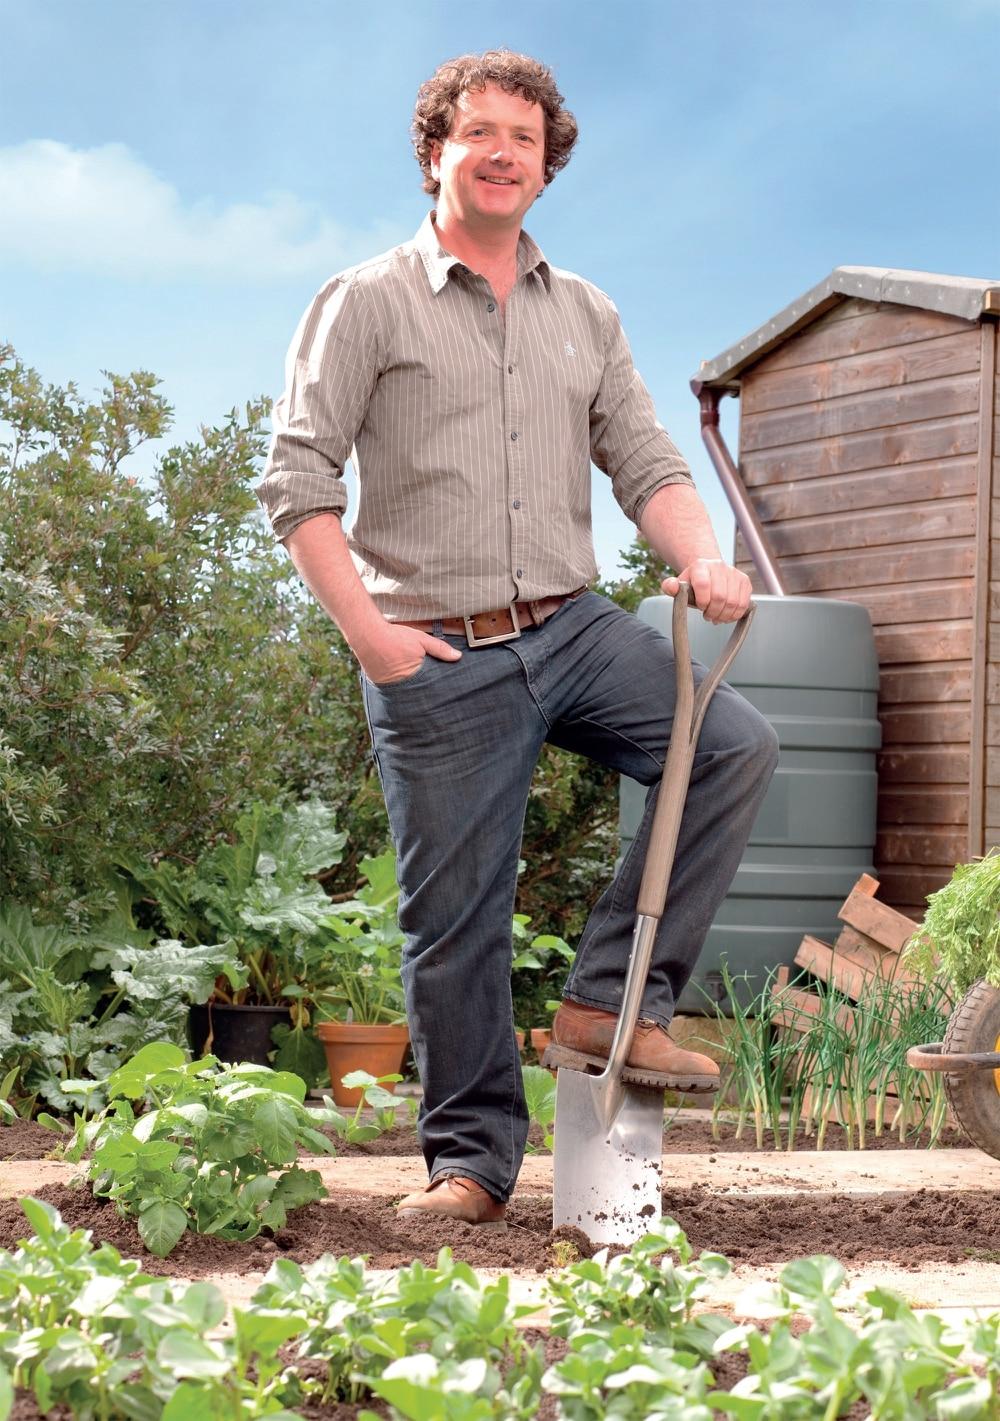 Diarmuid Gavin Talks Ahead Of Gardeners' World Live At